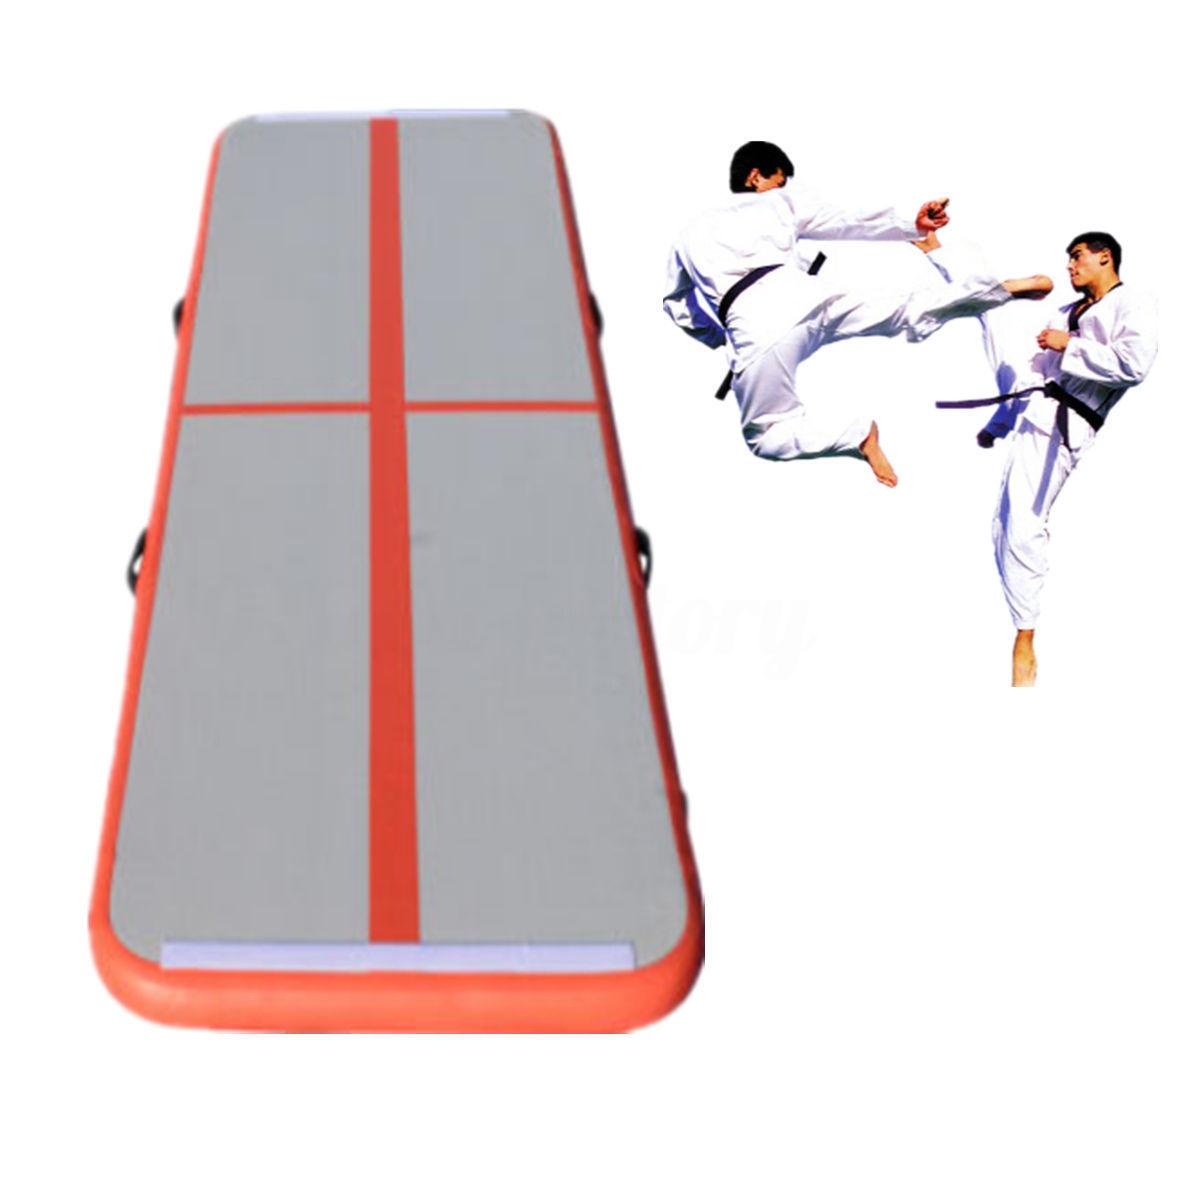 inflatable air track aufblasbar air tumbling track gymnastikmatte yogamatte gym ebay. Black Bedroom Furniture Sets. Home Design Ideas